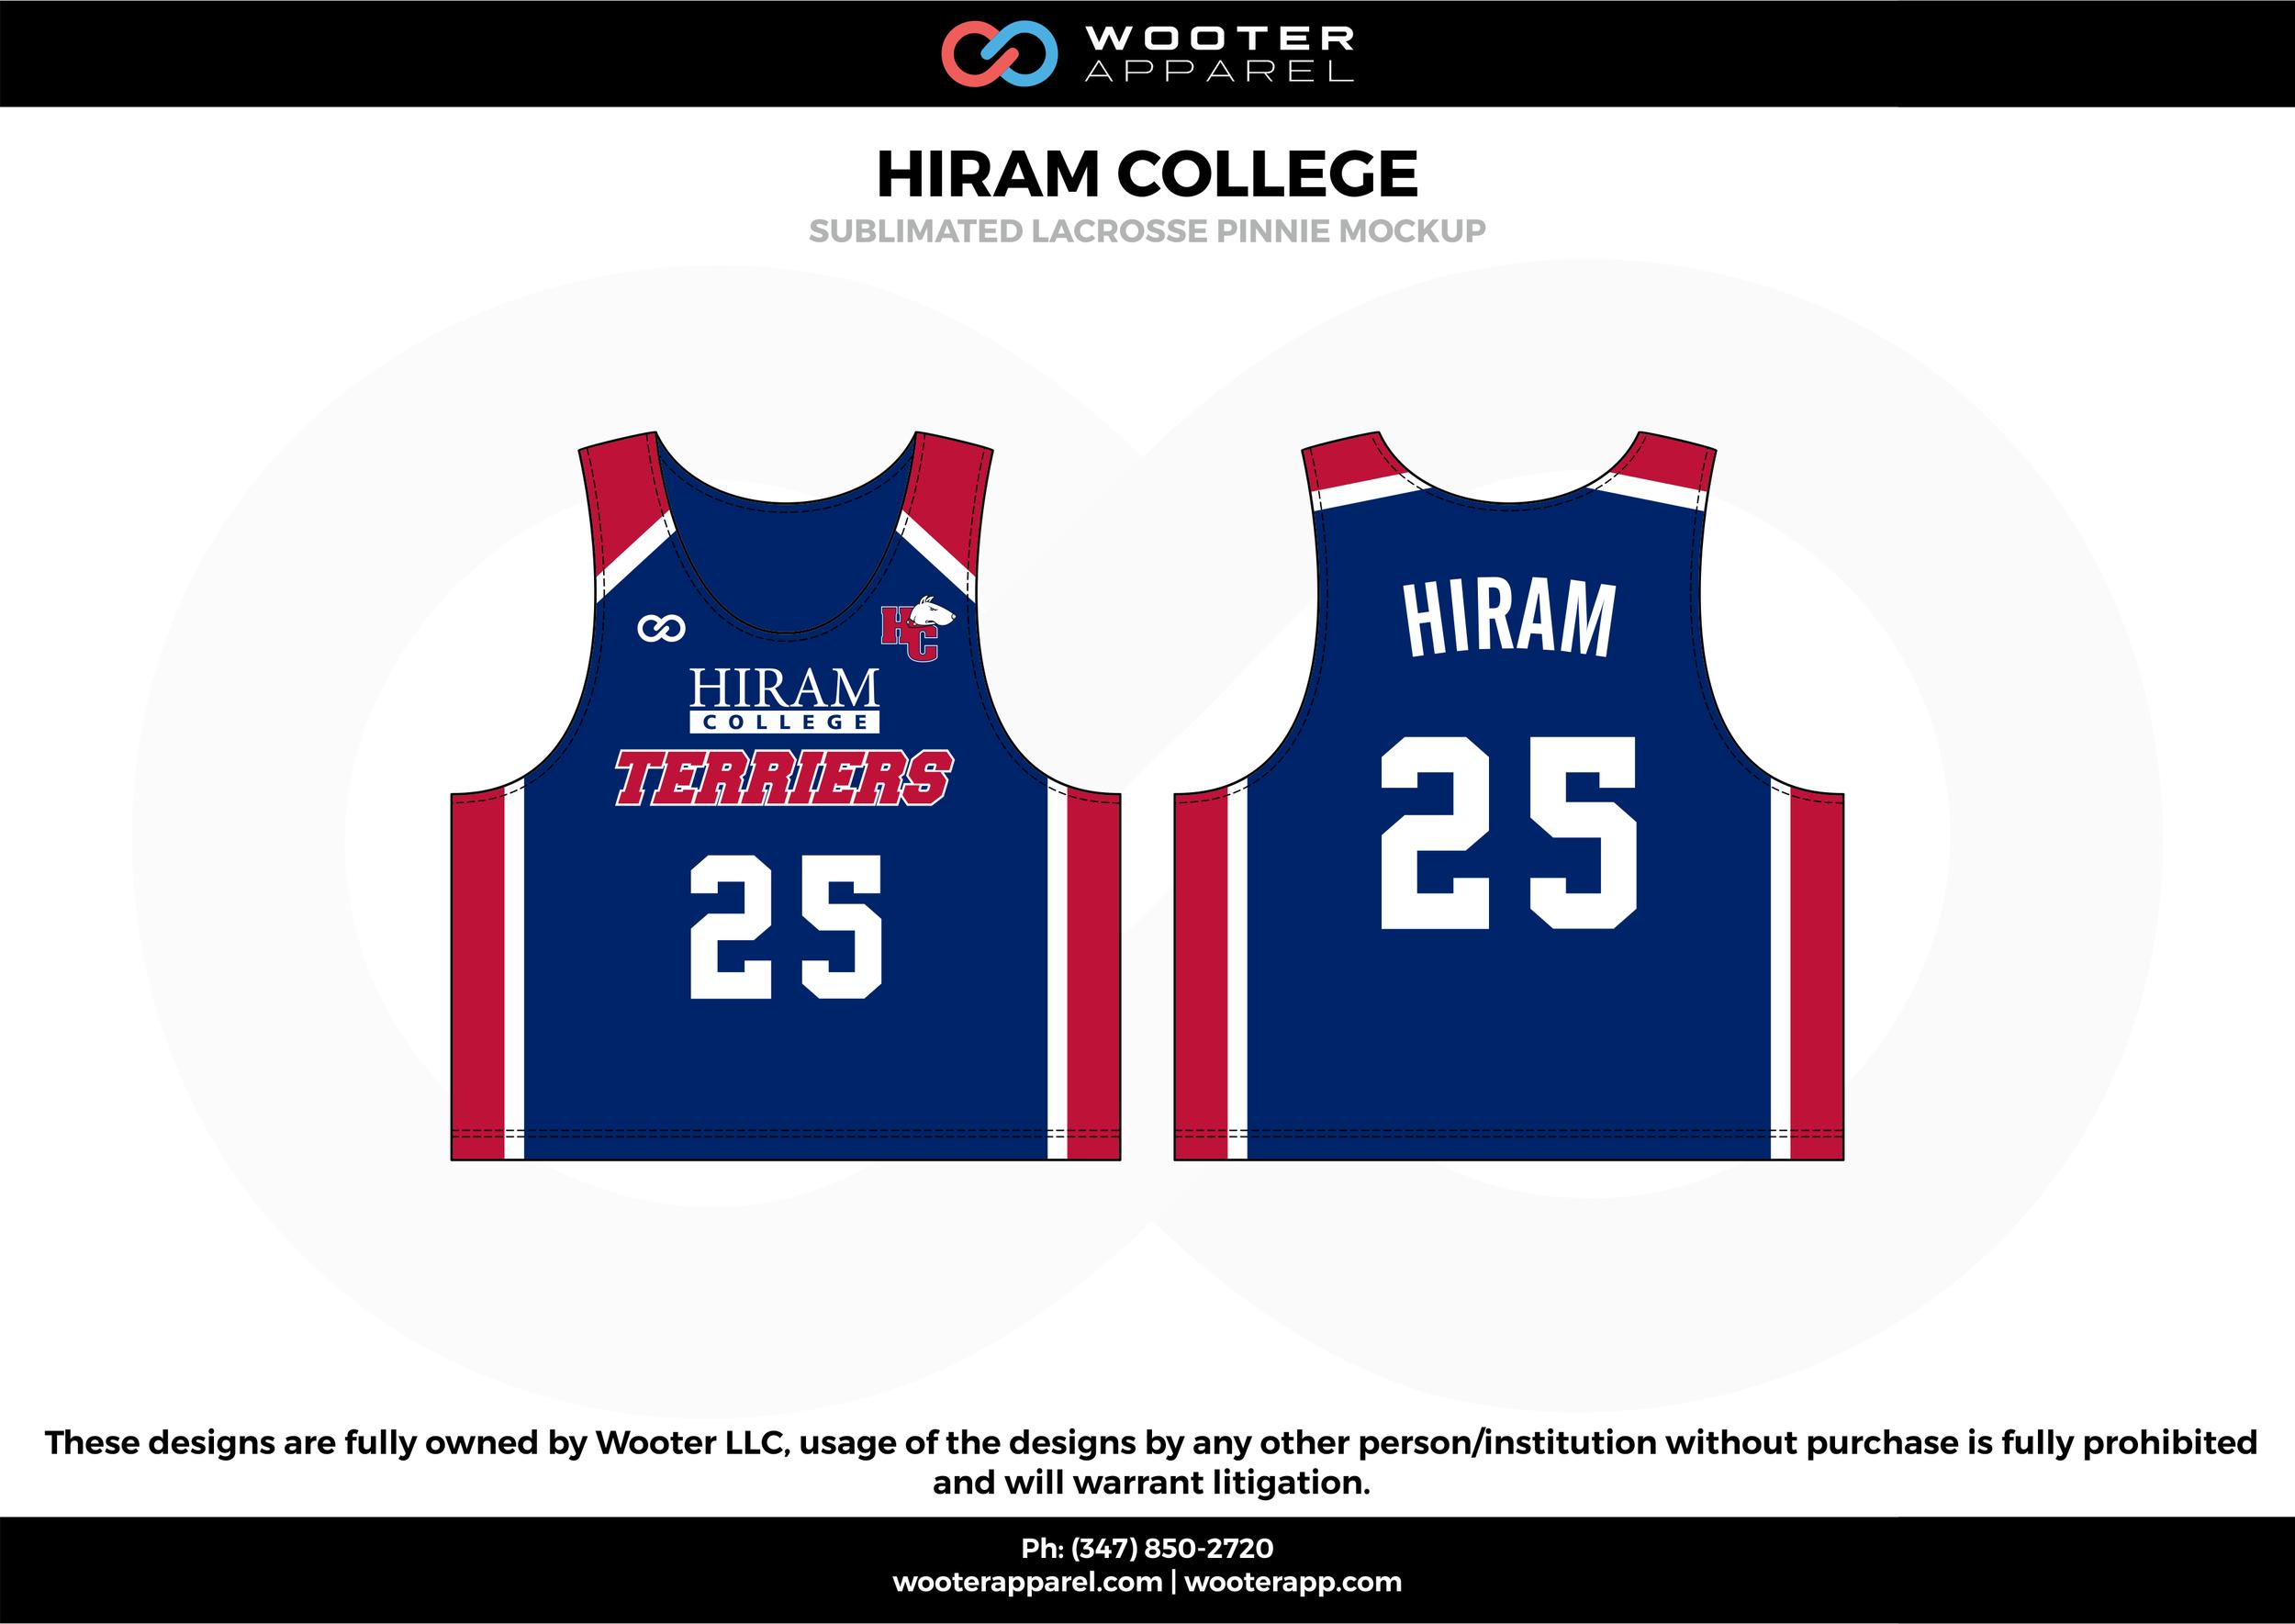 HIRAM COLLEGE blue red white Lacrosse uniforms reversible pinnies jerseys